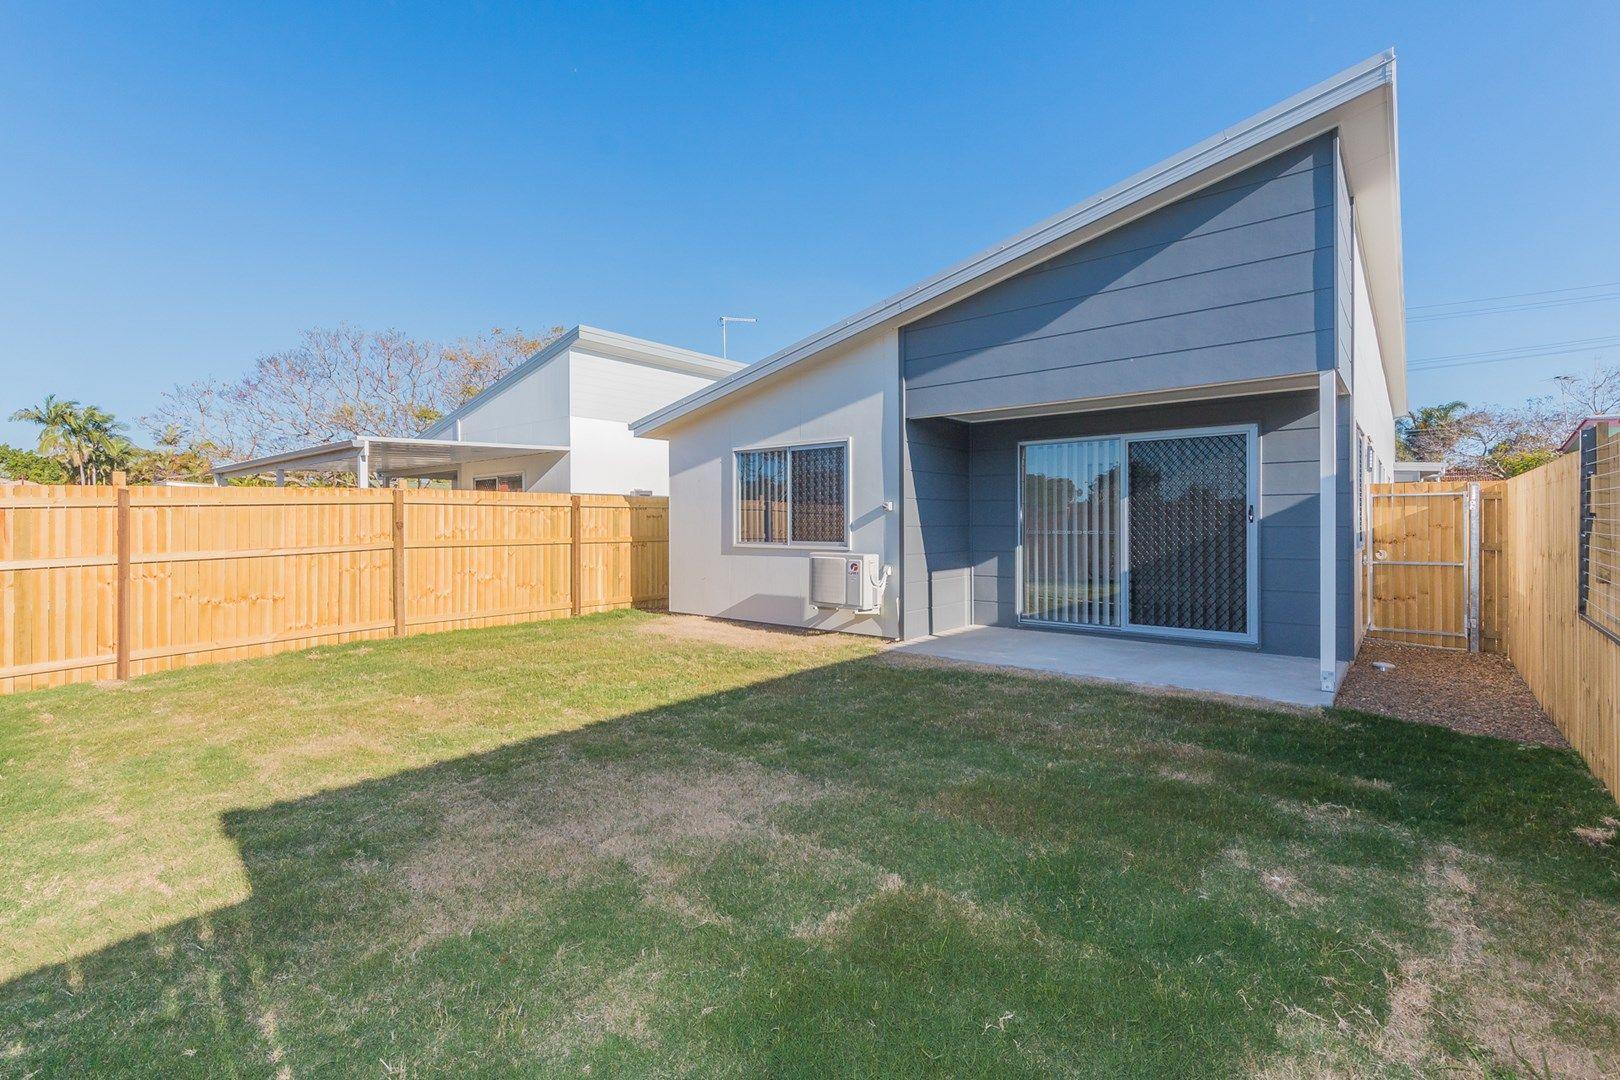 2/122a Klingner Road, Redcliffe QLD 4020, Image 0